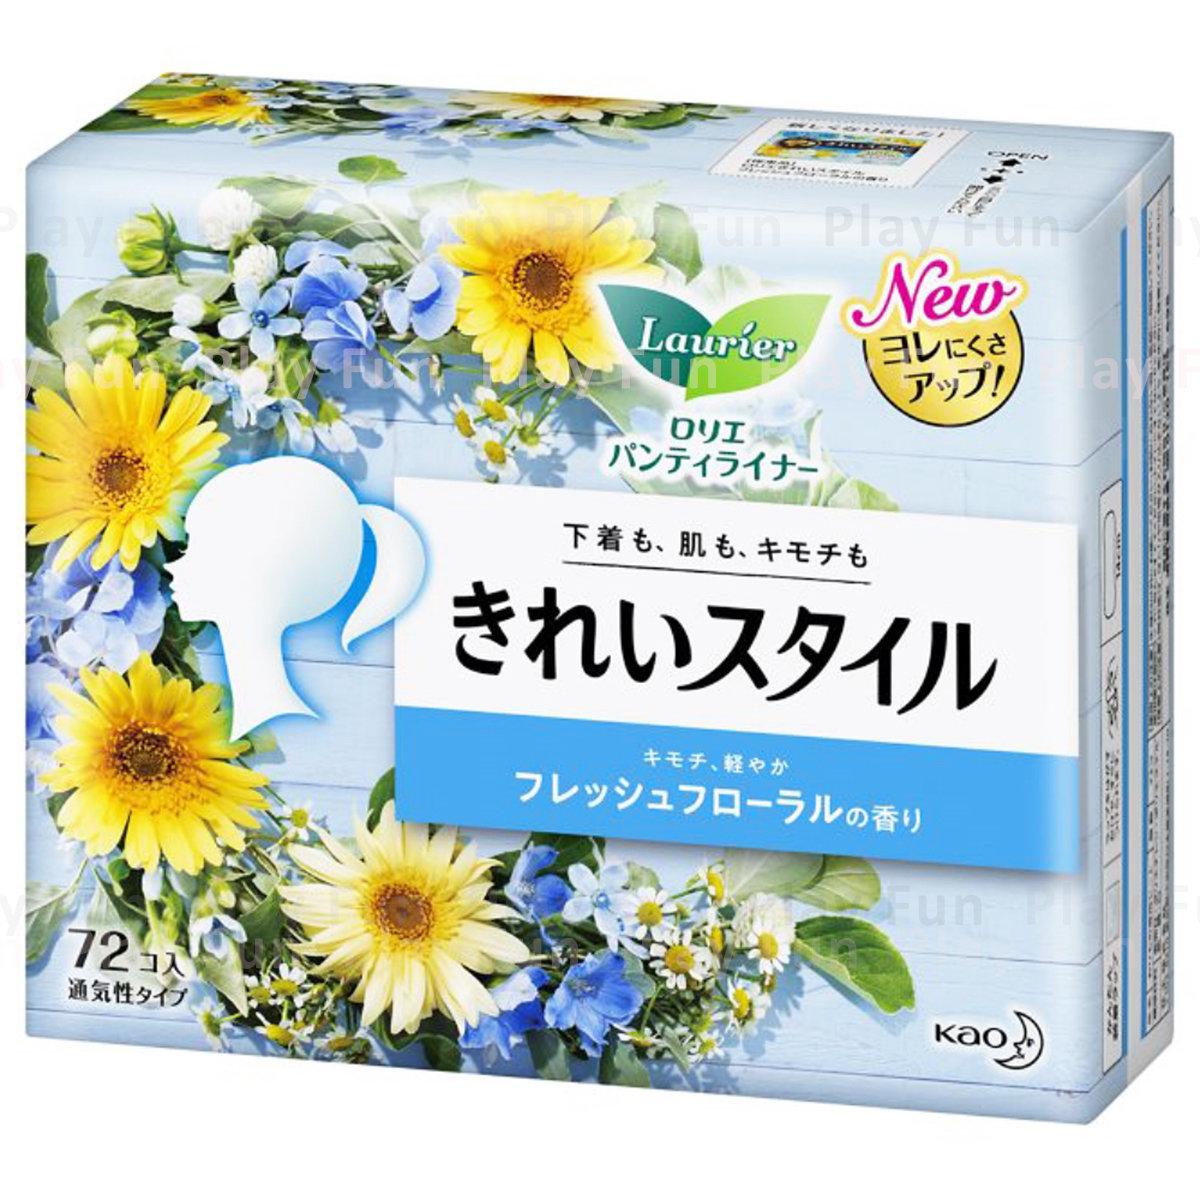 Laurier 護墊清新的花香味72片